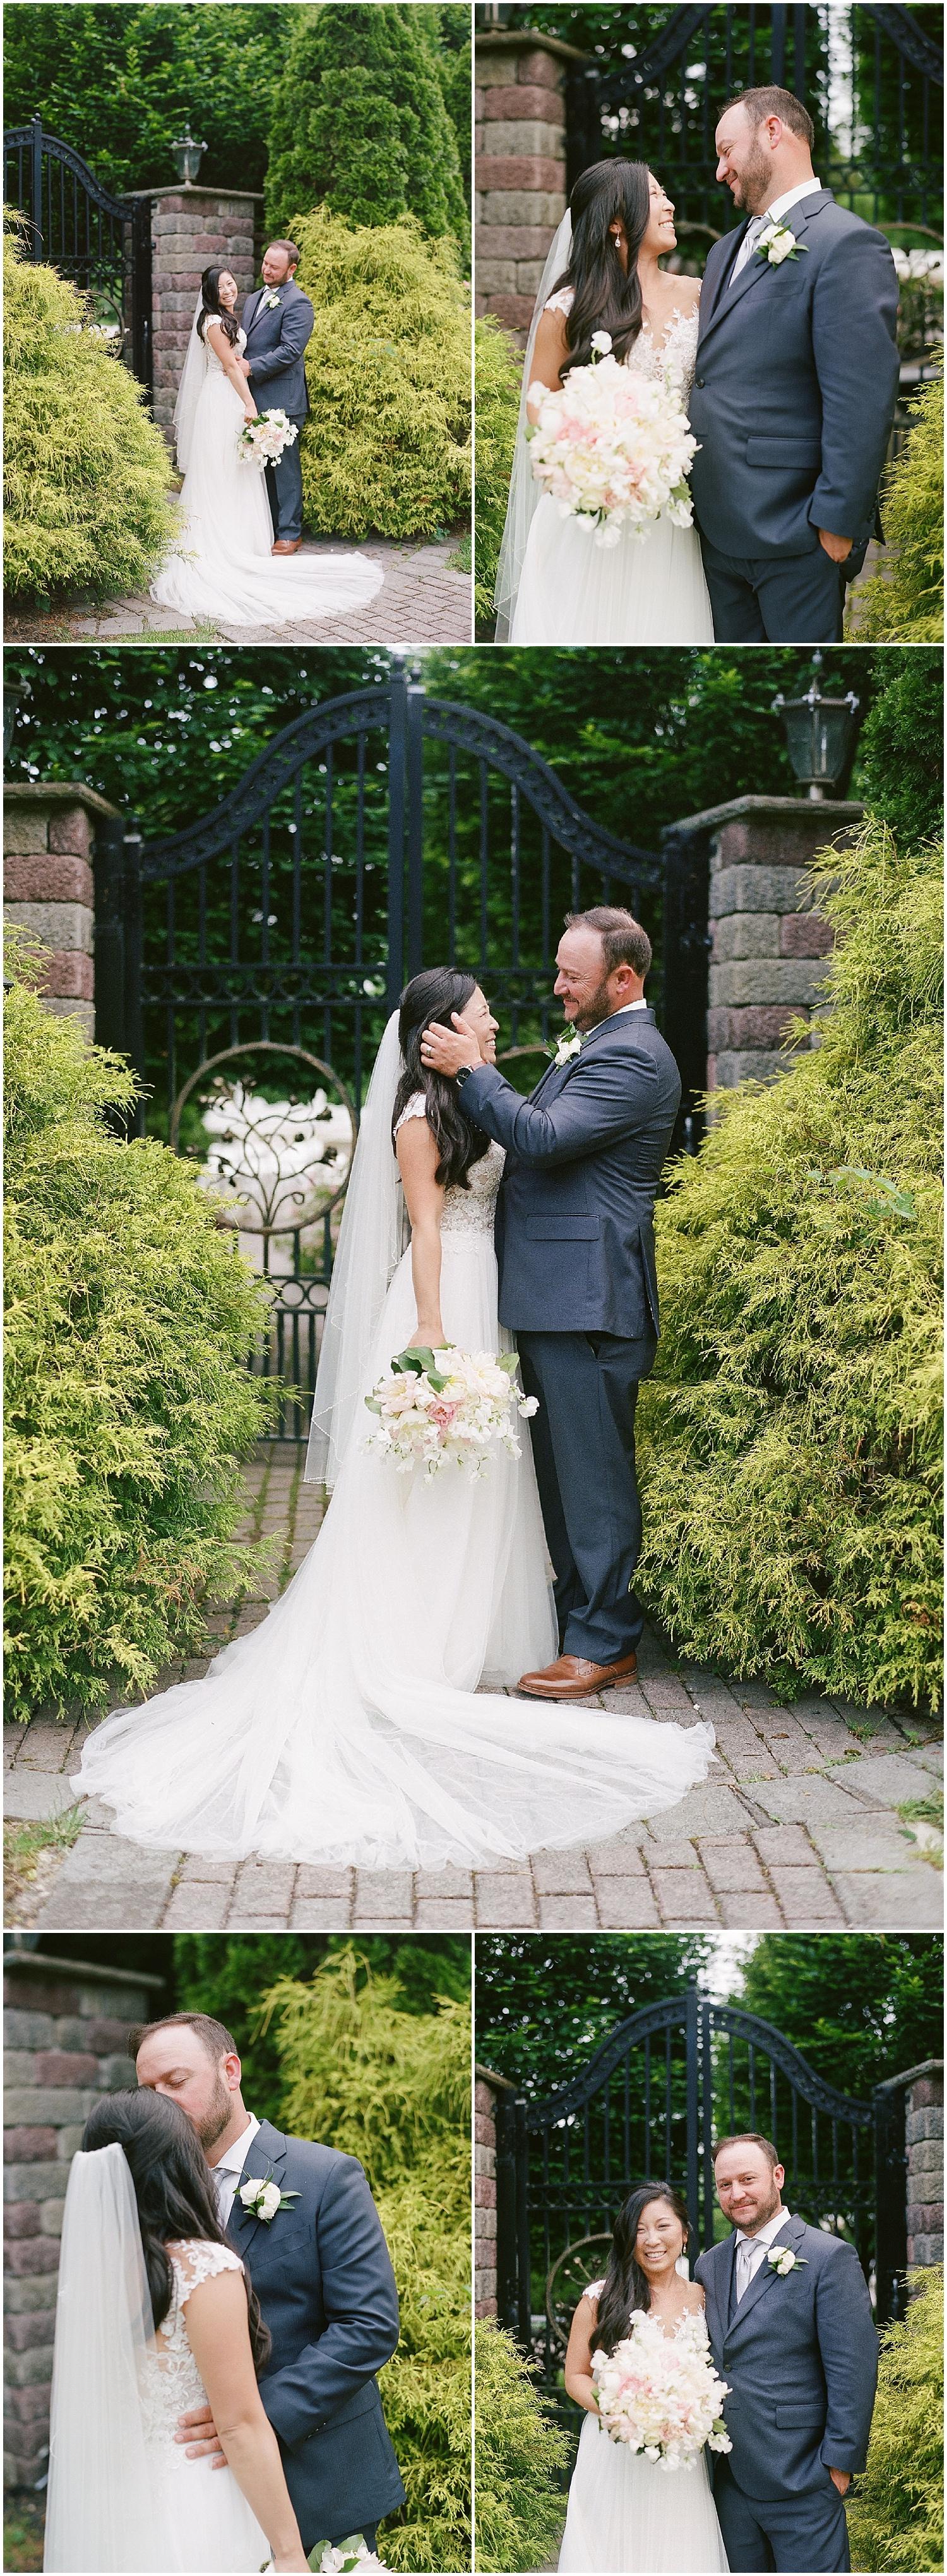 new jersey outdoor wedding, Monmouth University Wilson Hall, natural light photographer, film photographer, beautiful bride and groom portraits